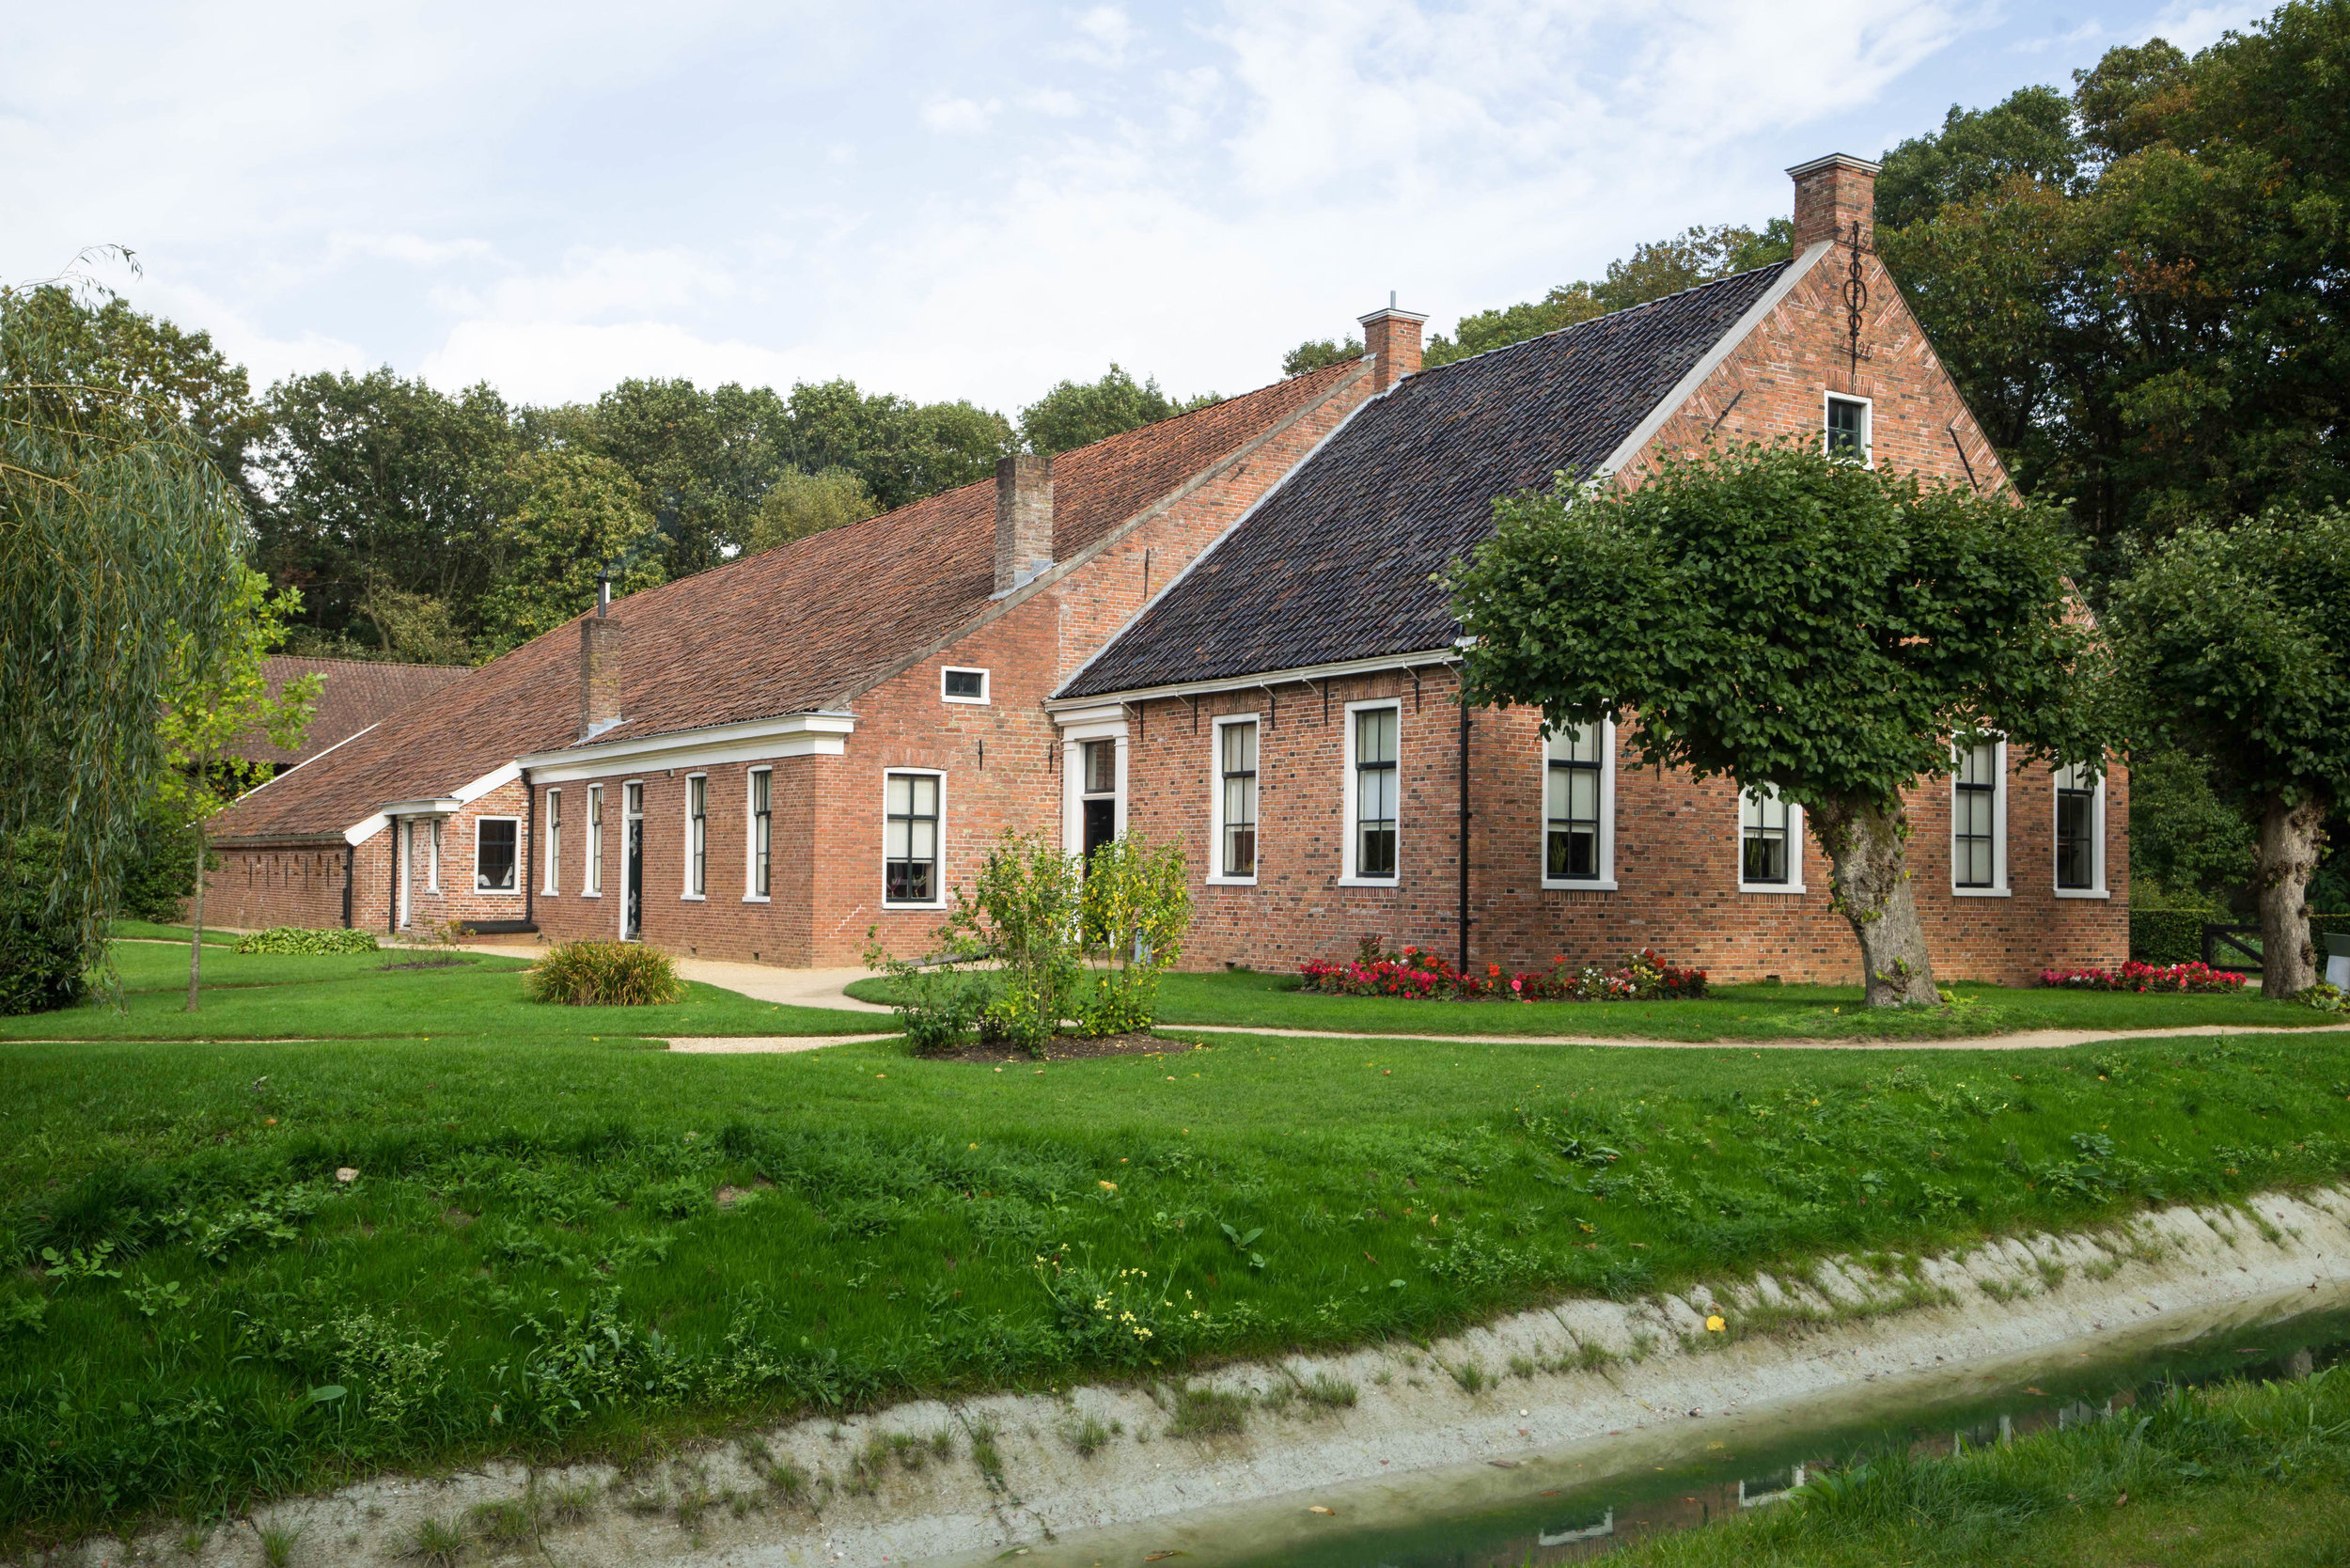 Nederland 10-01-2017 Dev LR-153.jpg